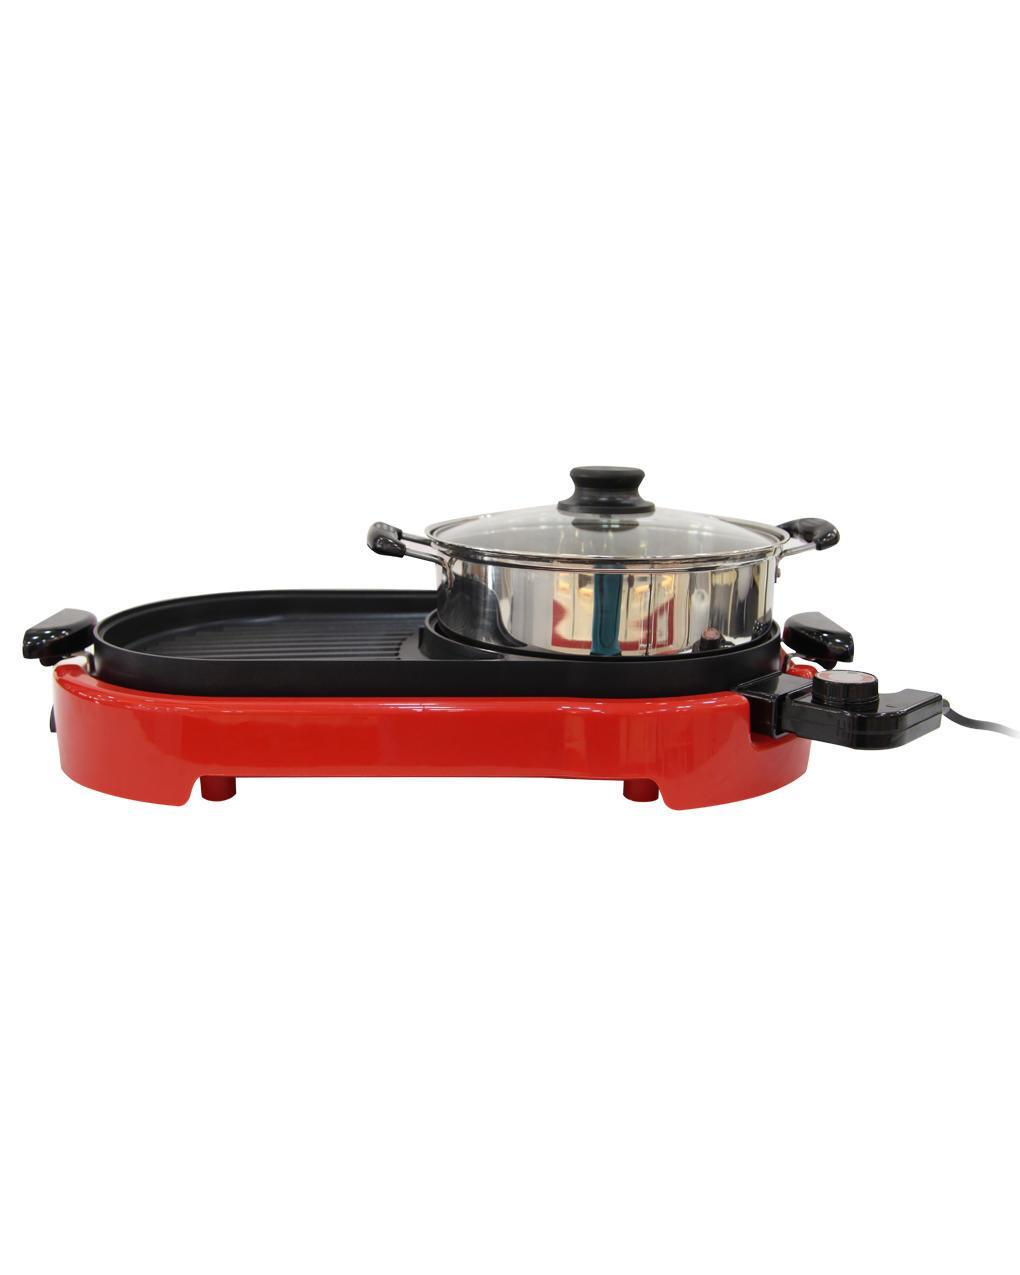 Nibban EG-001 Electric Grill ေဟာ့ေပါ့ႏွင့္အသားကင္စက္